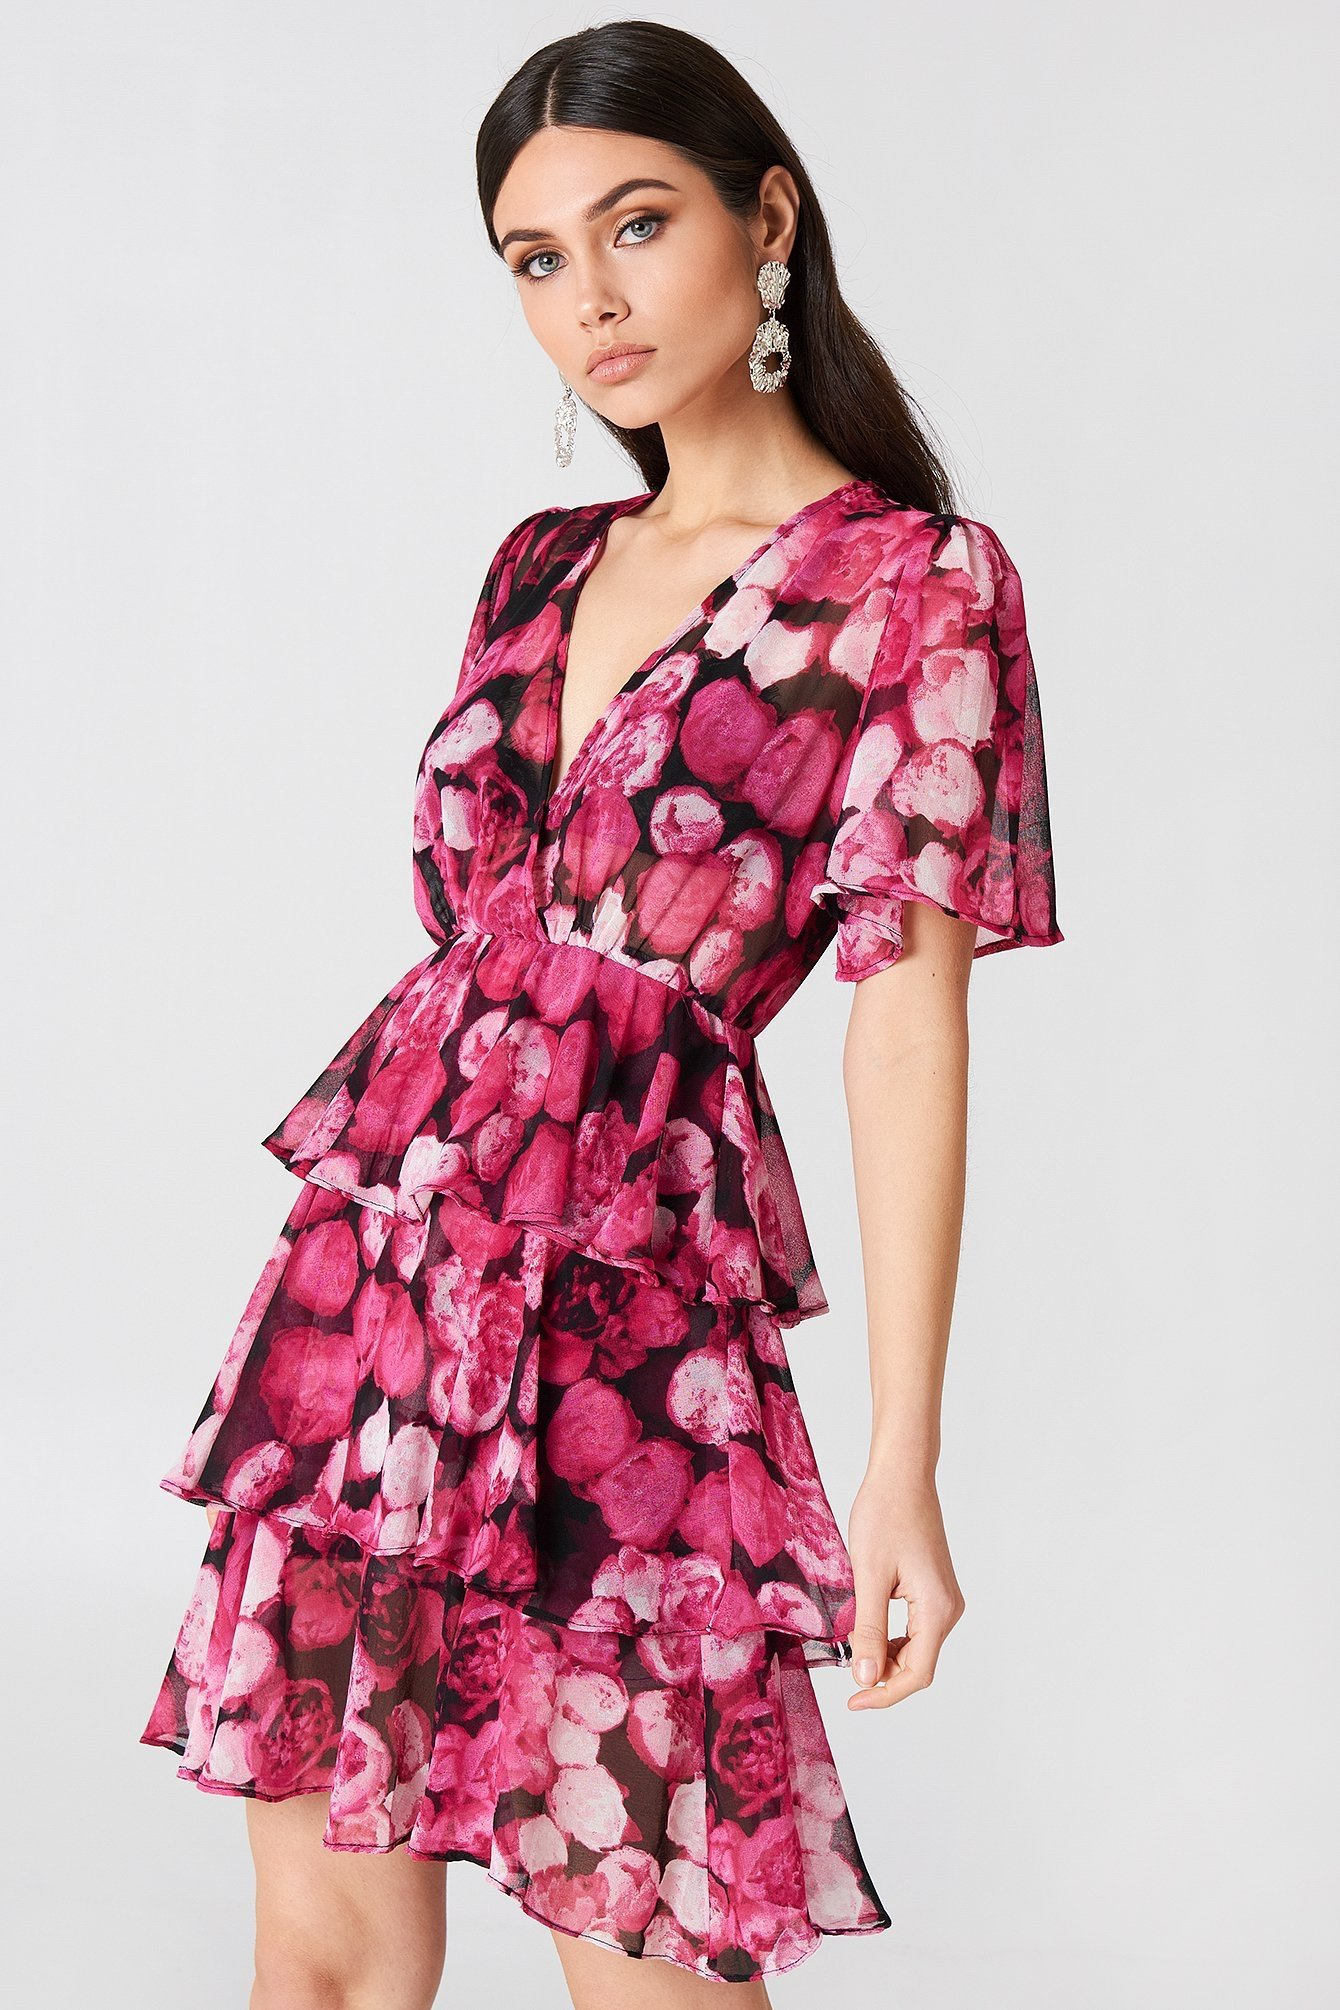 nakd triple layer flounce dress STL 38 (348795016) ᐈ Köp på